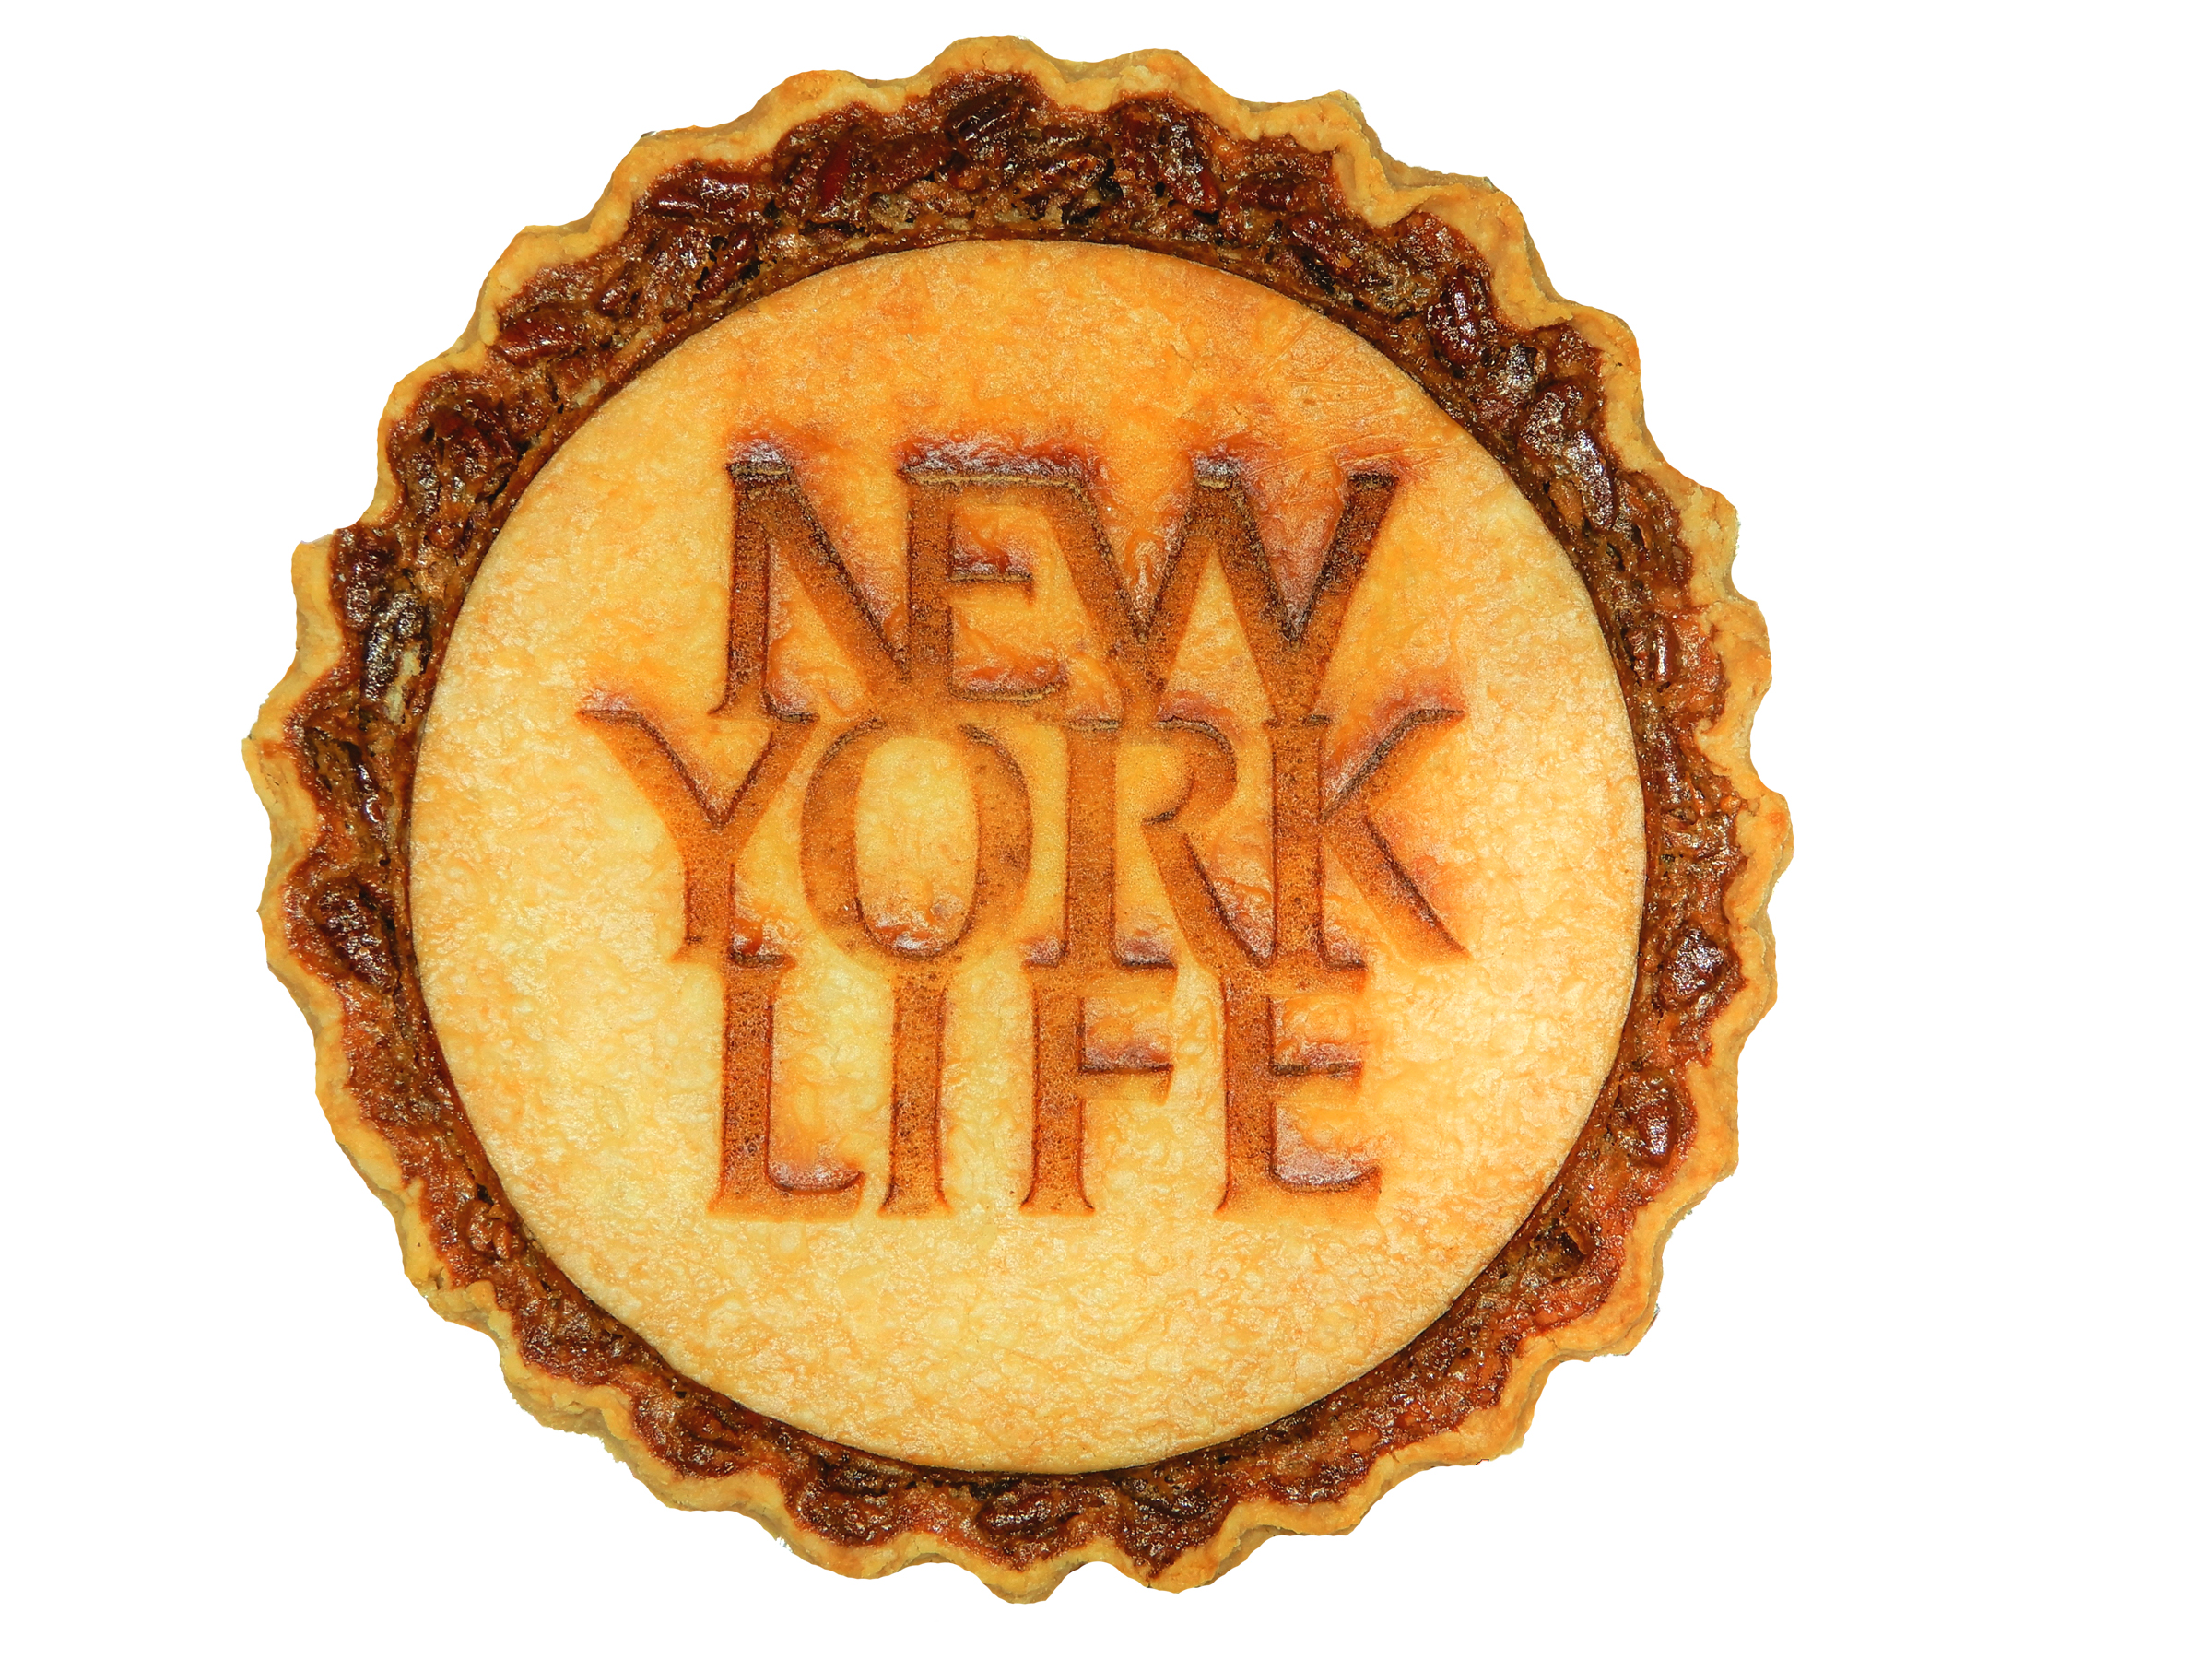 Custom Pie with Corporate Logo